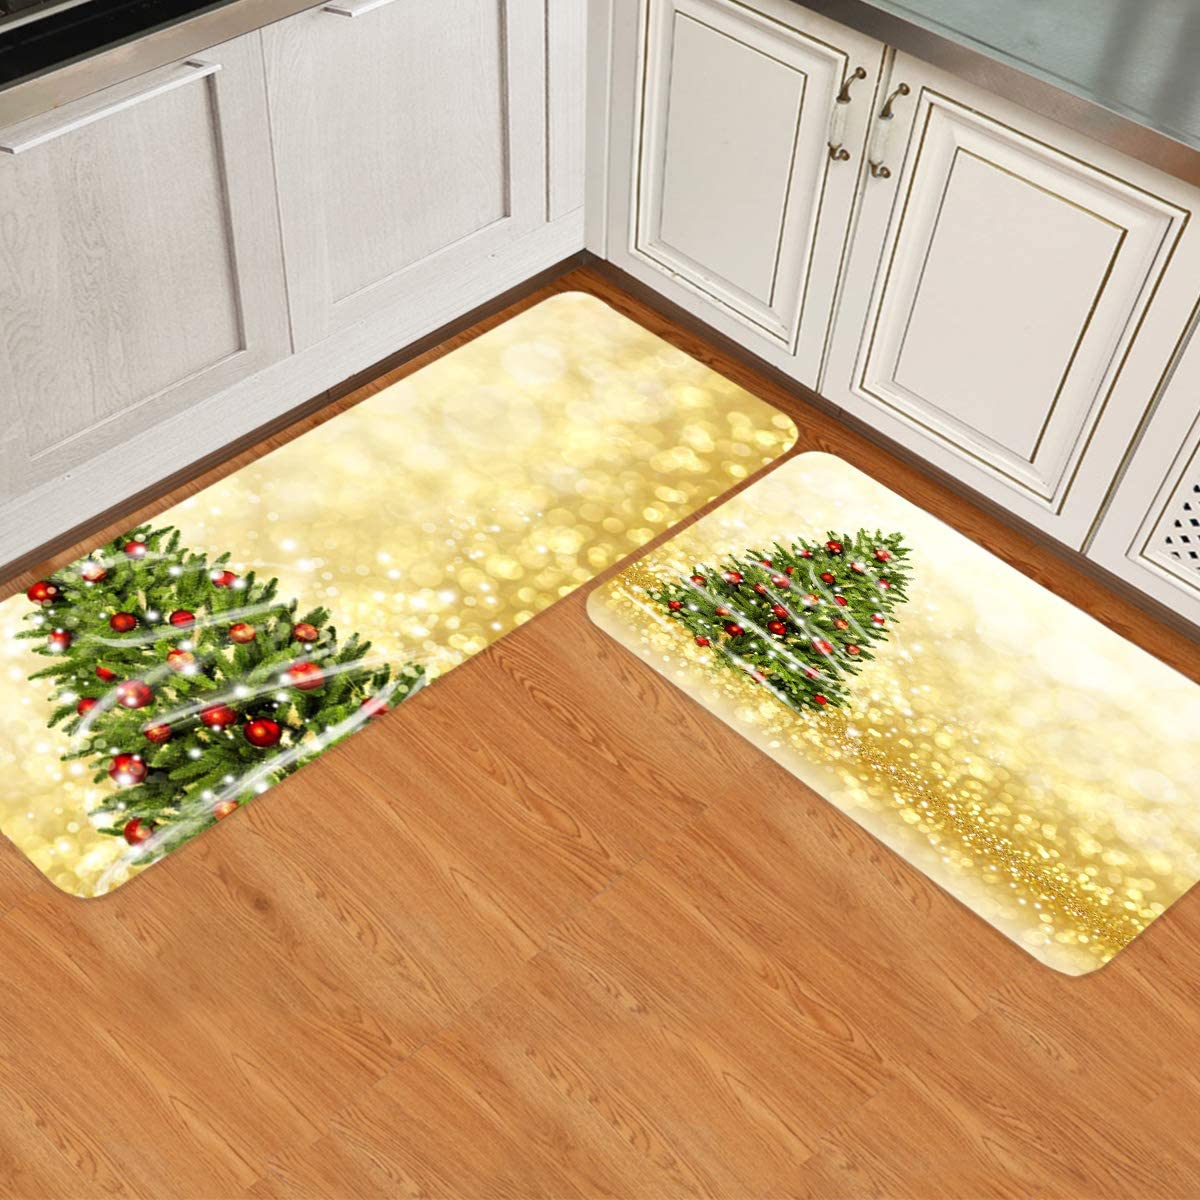 Leotear Kitchen Mat 4 years warranty 2021new shipping free Christmas Tree Polka Dot Backgroun on Golden